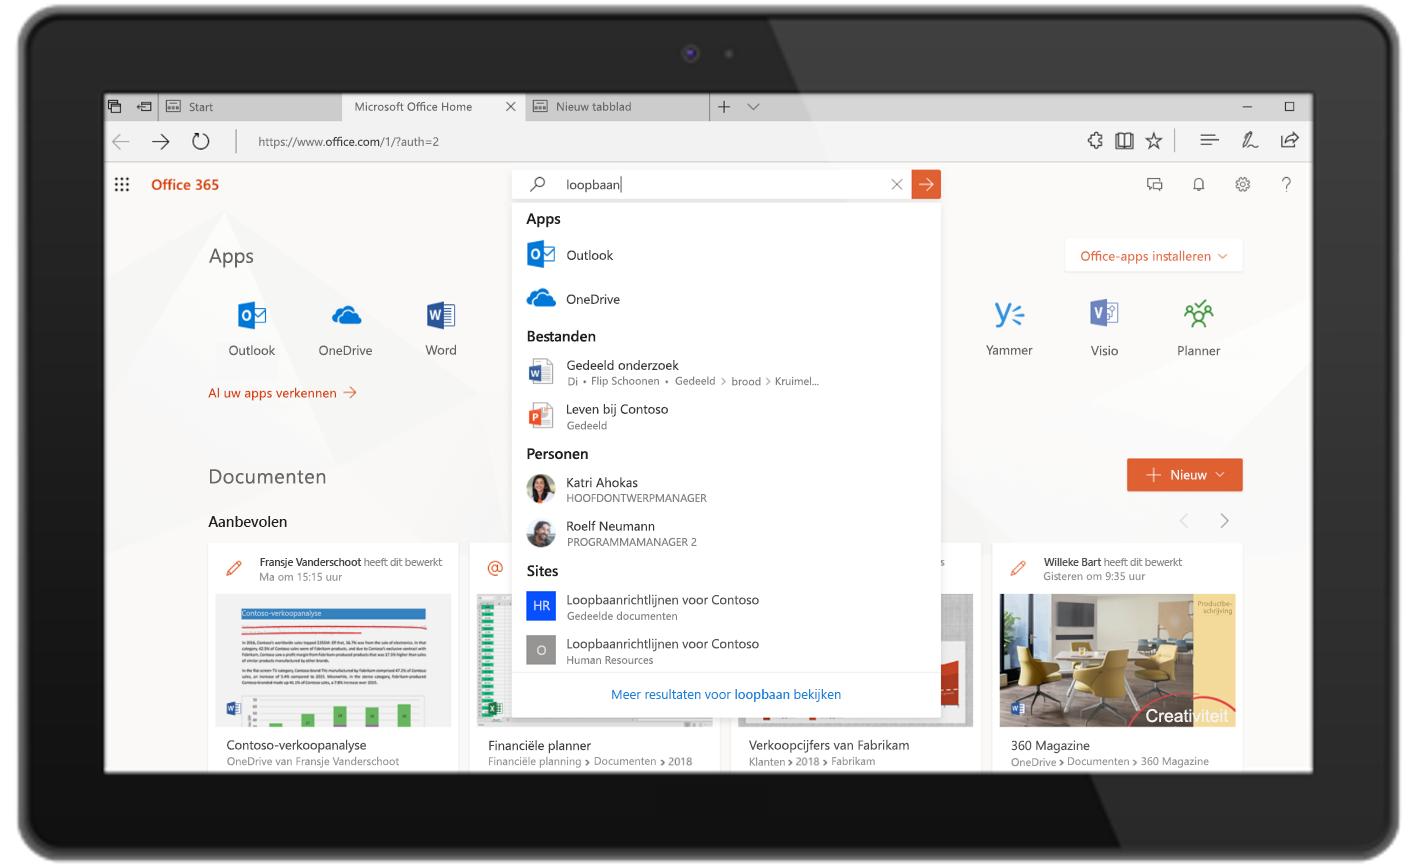 Afbeelding van Microsoft Search in Office.com.